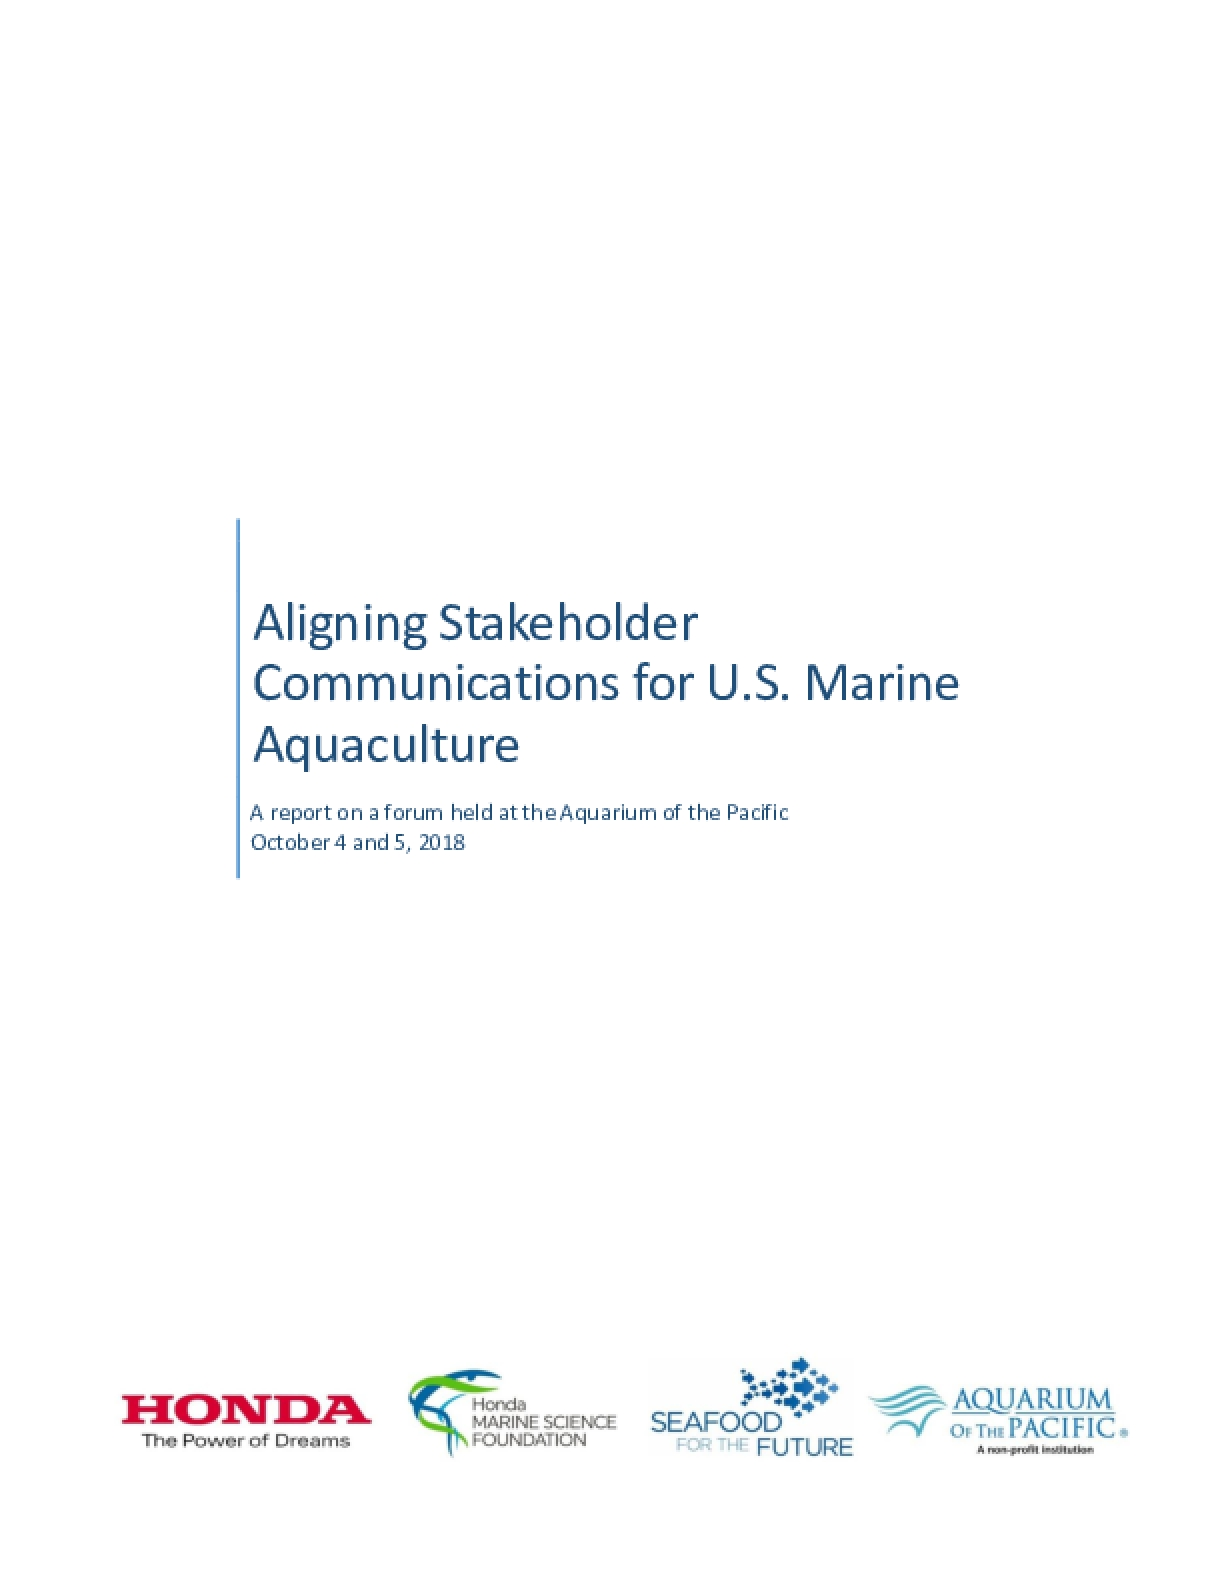 Aligning Stakeholder Communications for U.S. Marine  Aquaculture